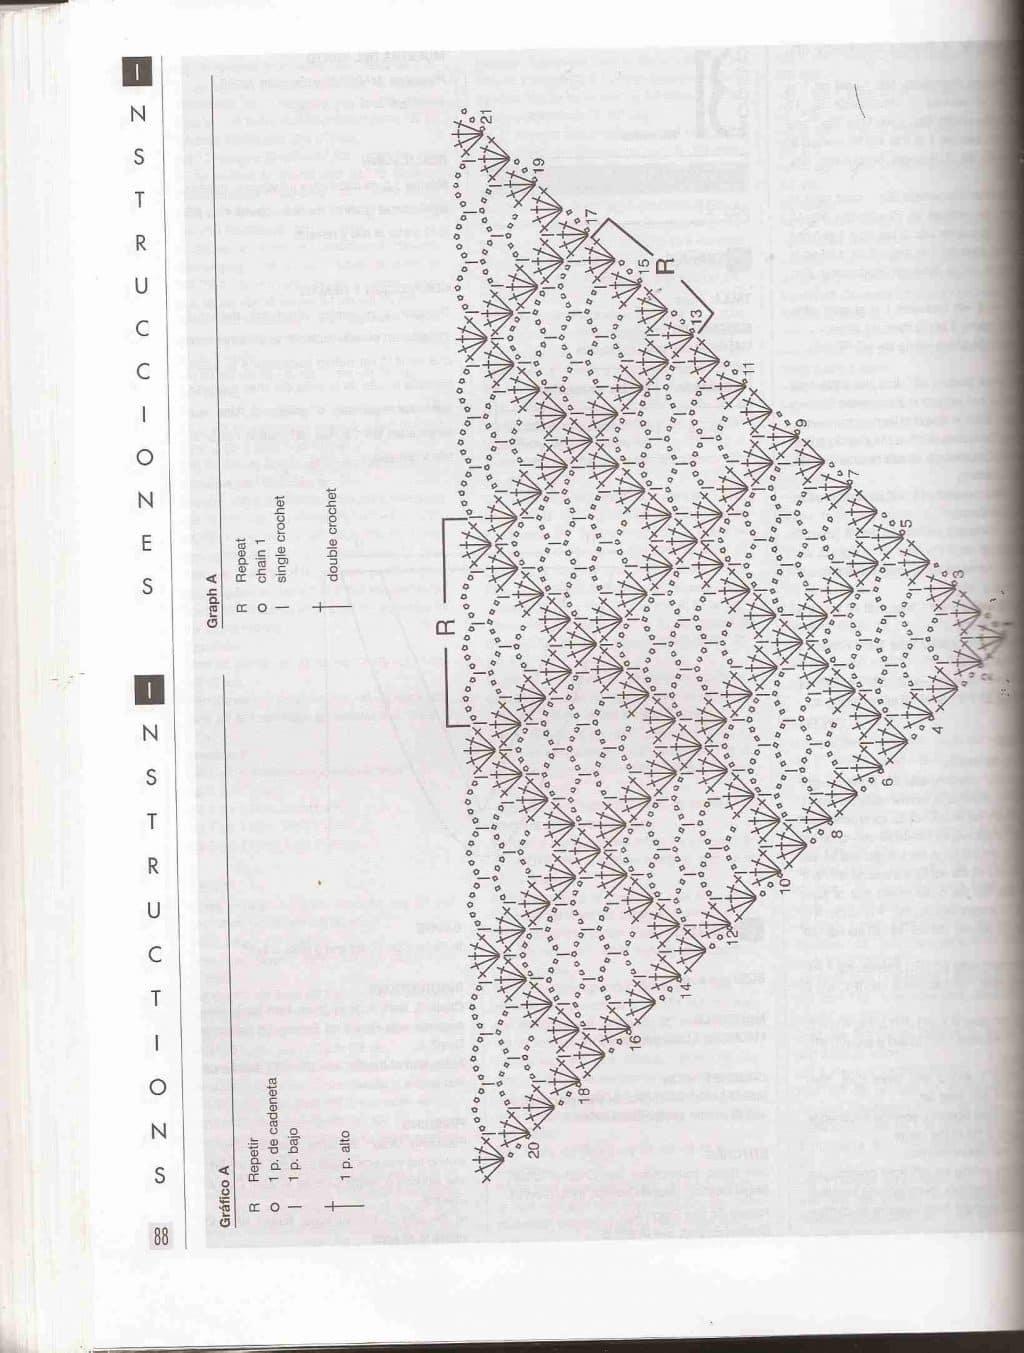 Chal fácil ⭐ ESQUEMAS DE CHAL GRATIS ⭐ ▷ Crochet Fácil